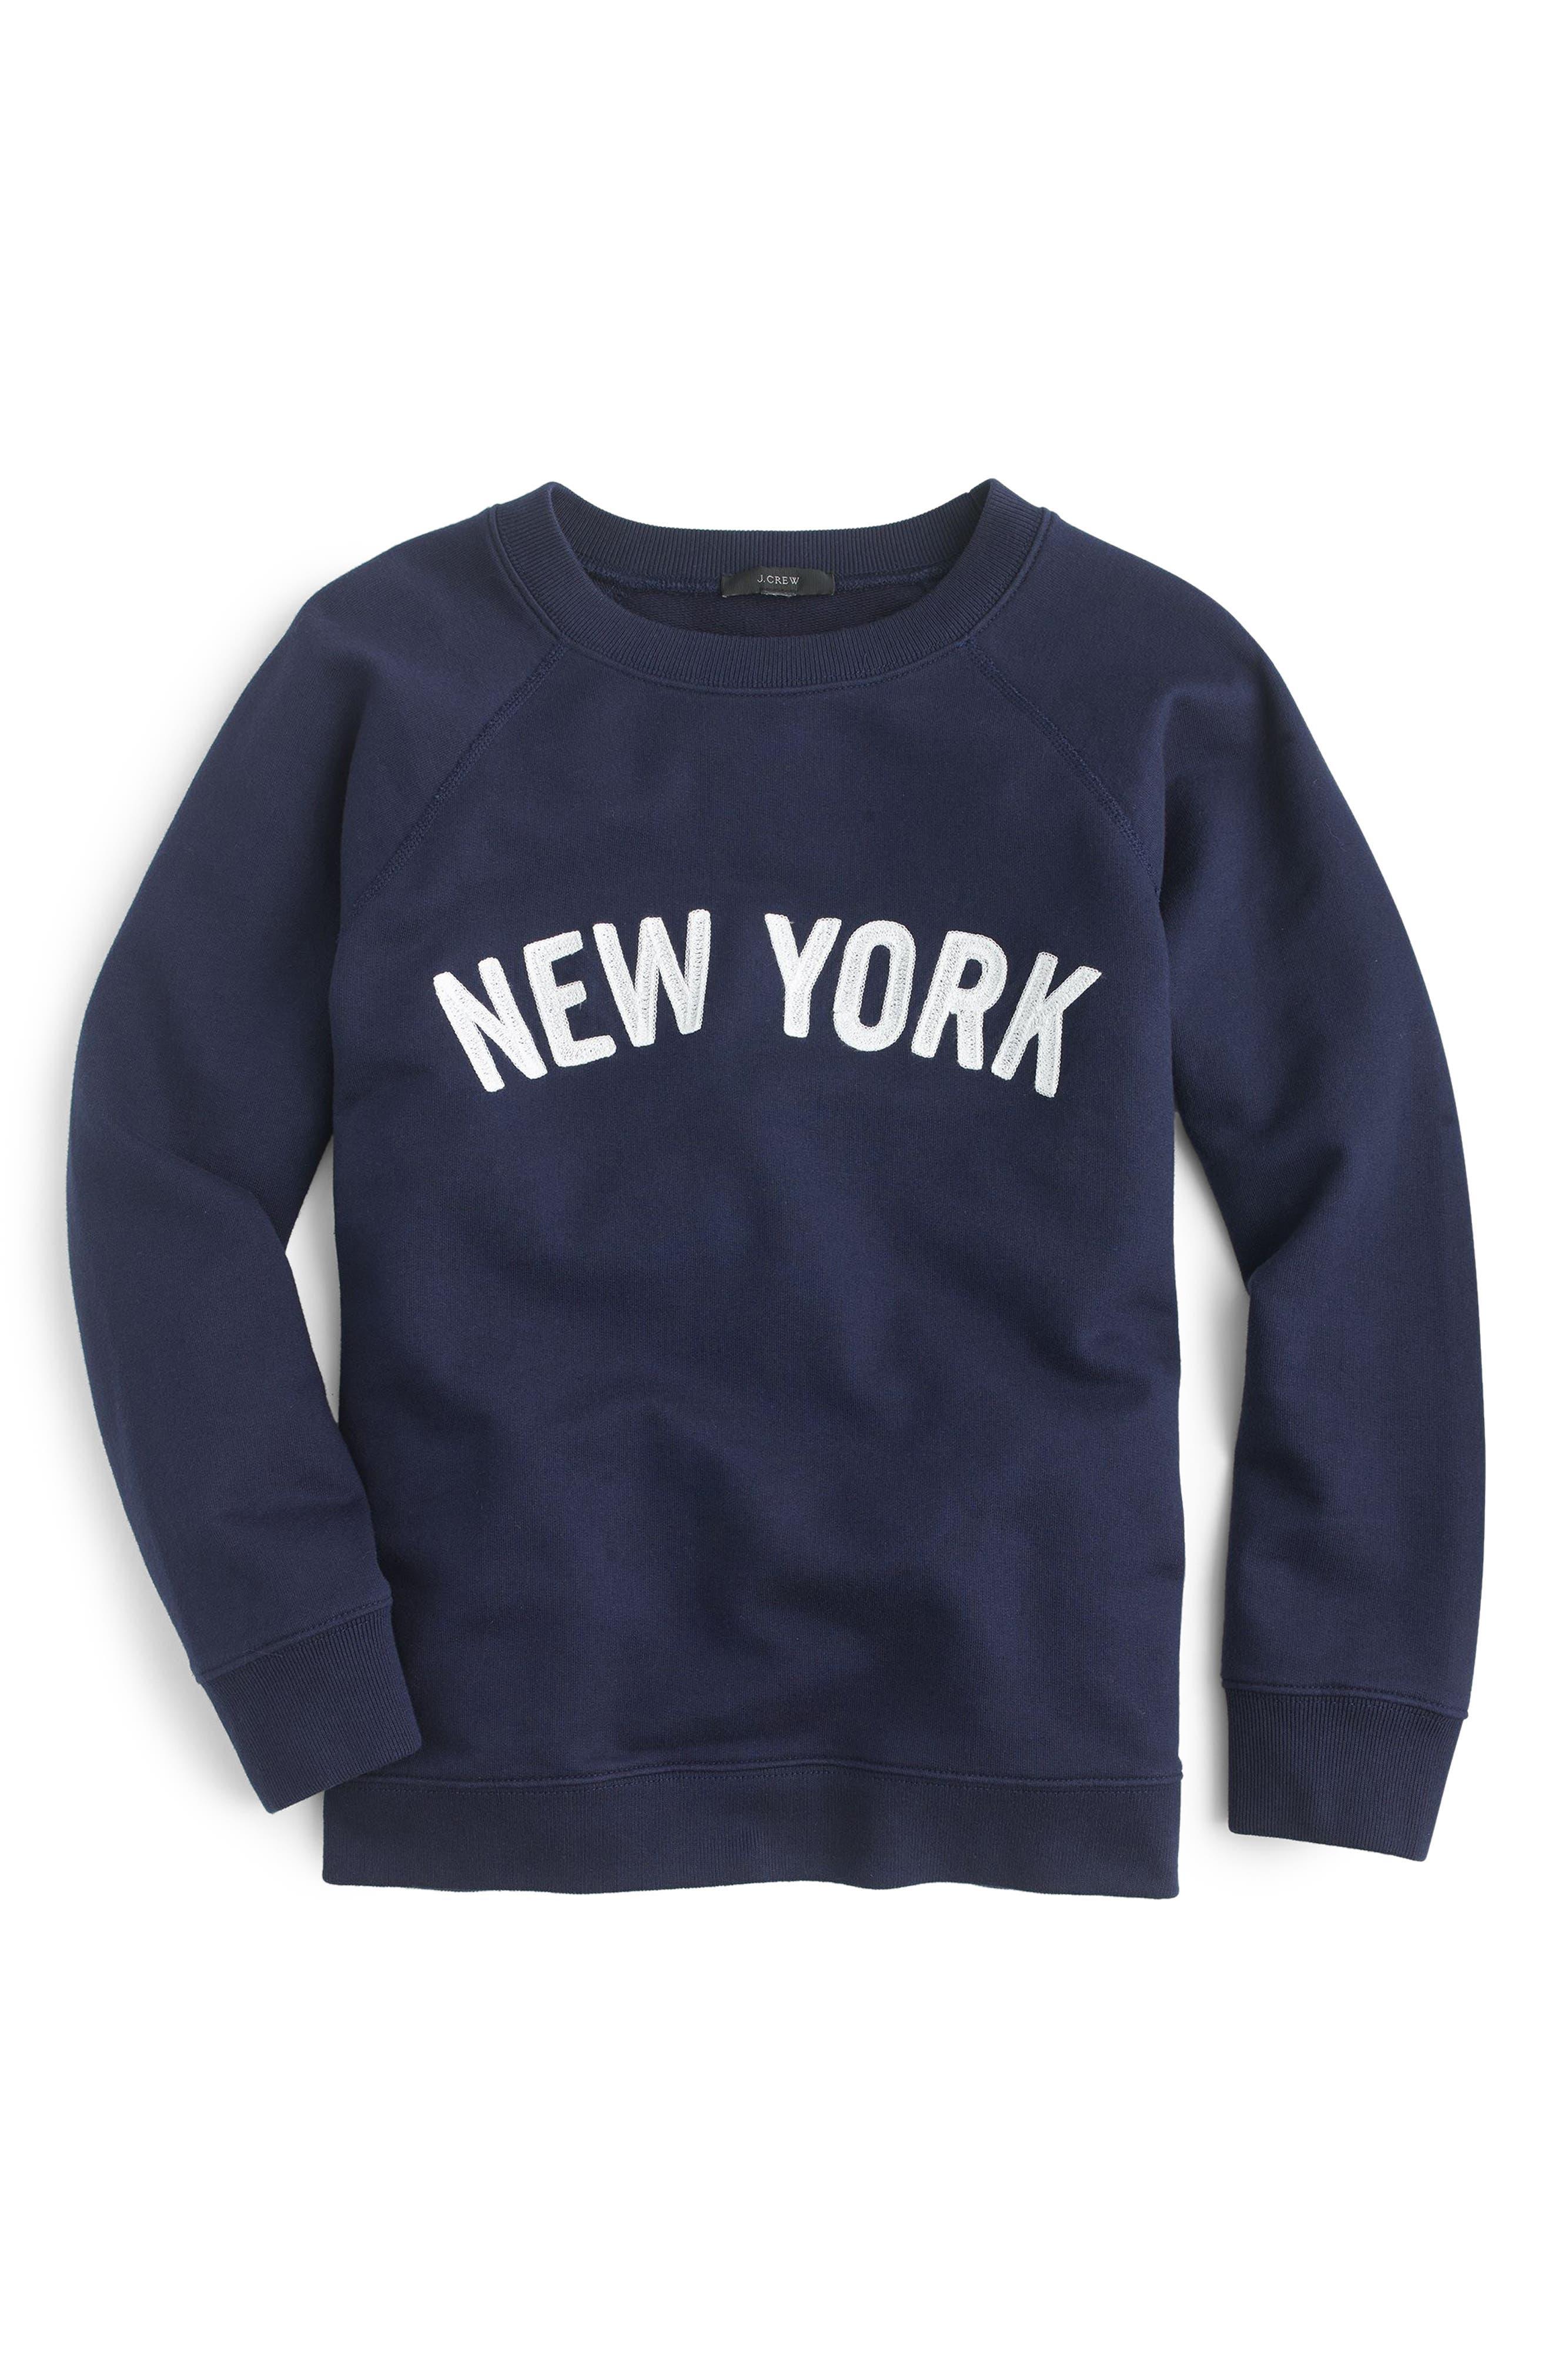 New York Sweatshirt,                             Alternate thumbnail 2, color,                             400